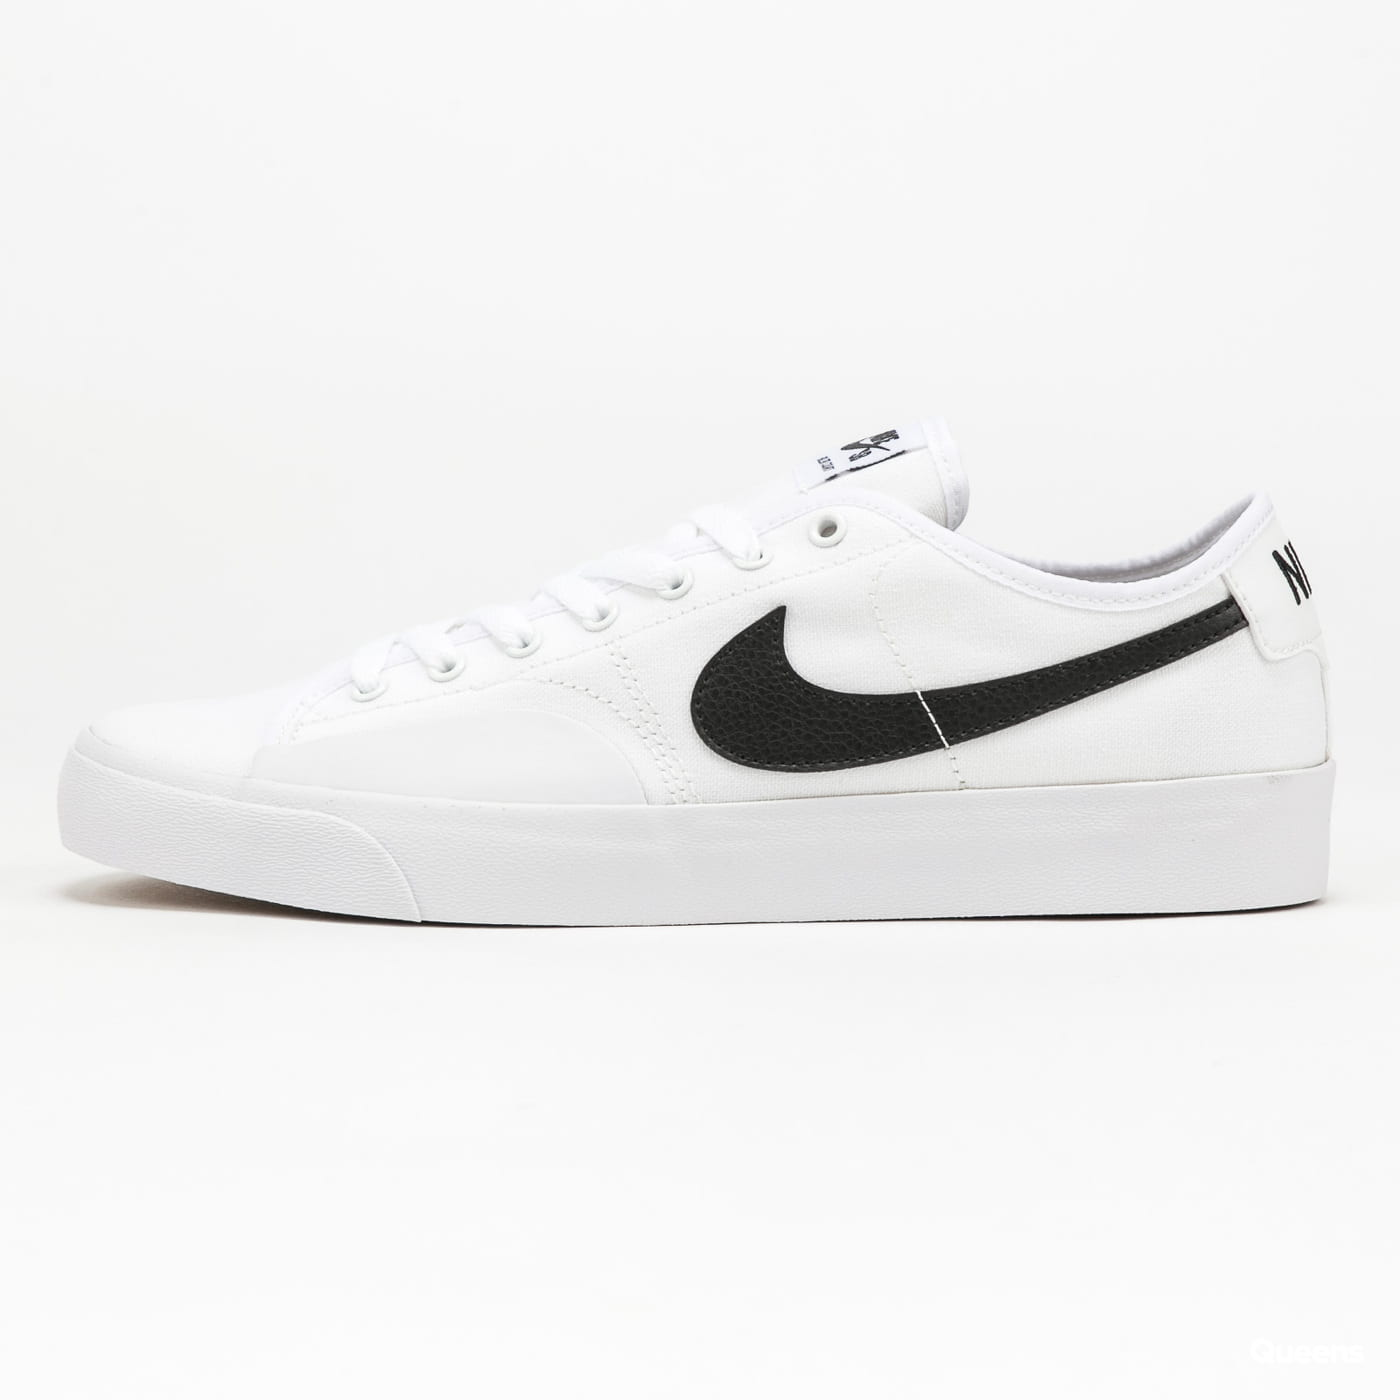 Nike SB Blazer Court white / black - white - black